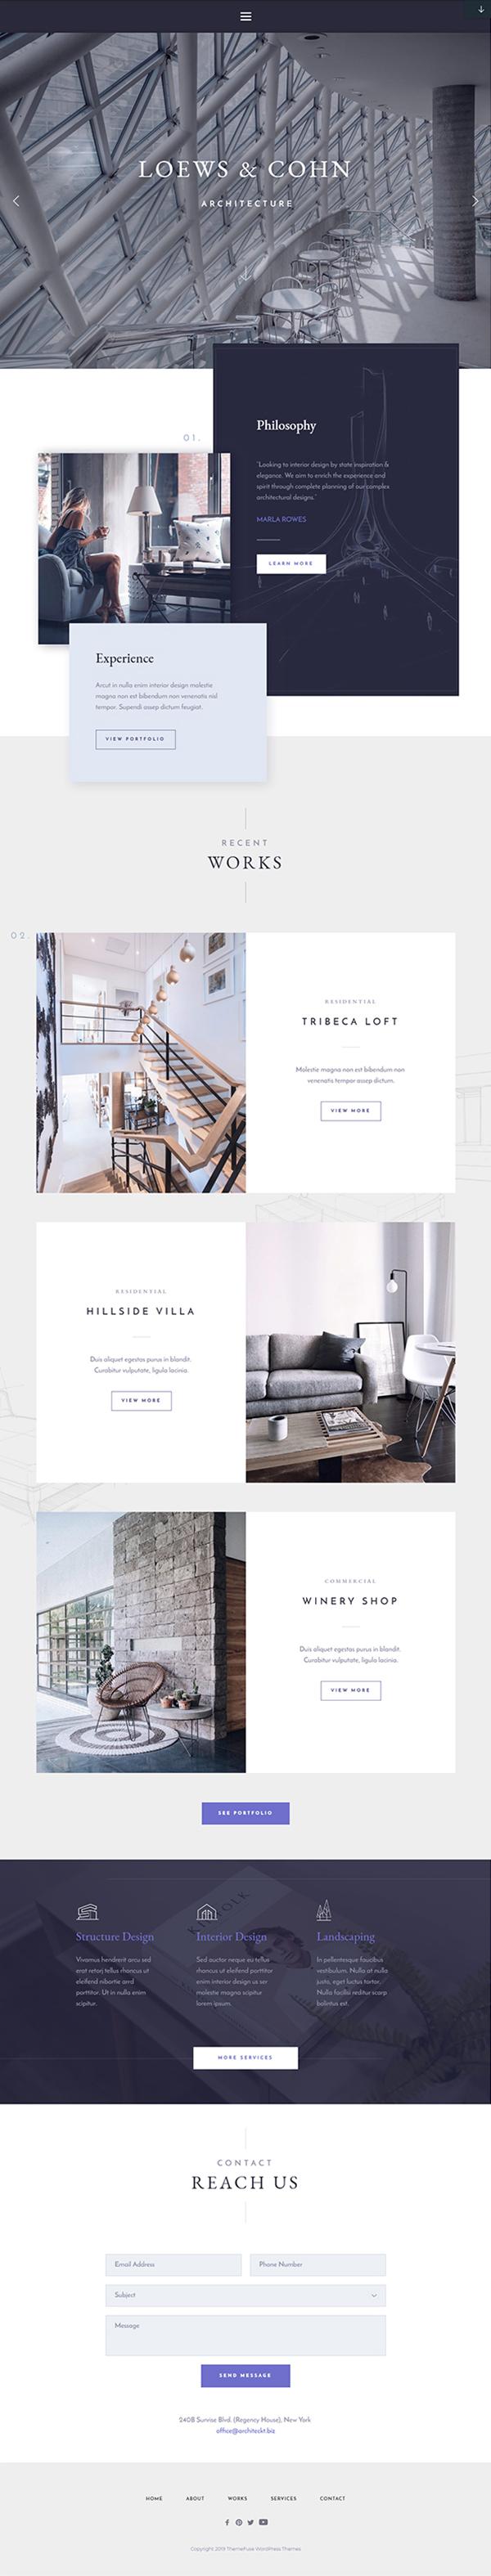 Architekt - WP Business Theme